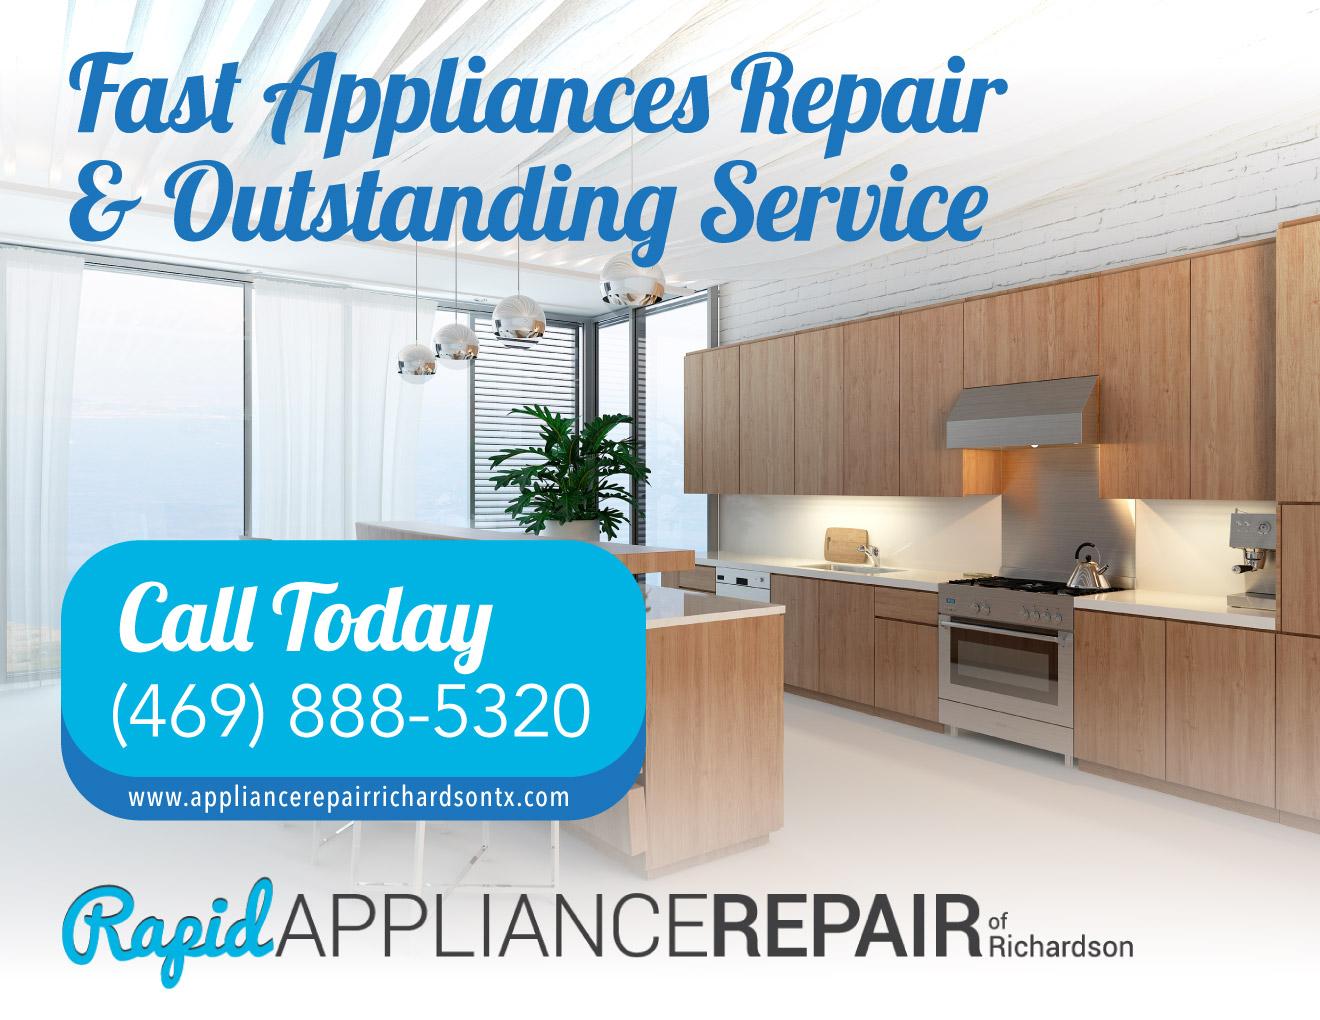 Rapid Appliance Repair of Richardson - (469) 888-5320